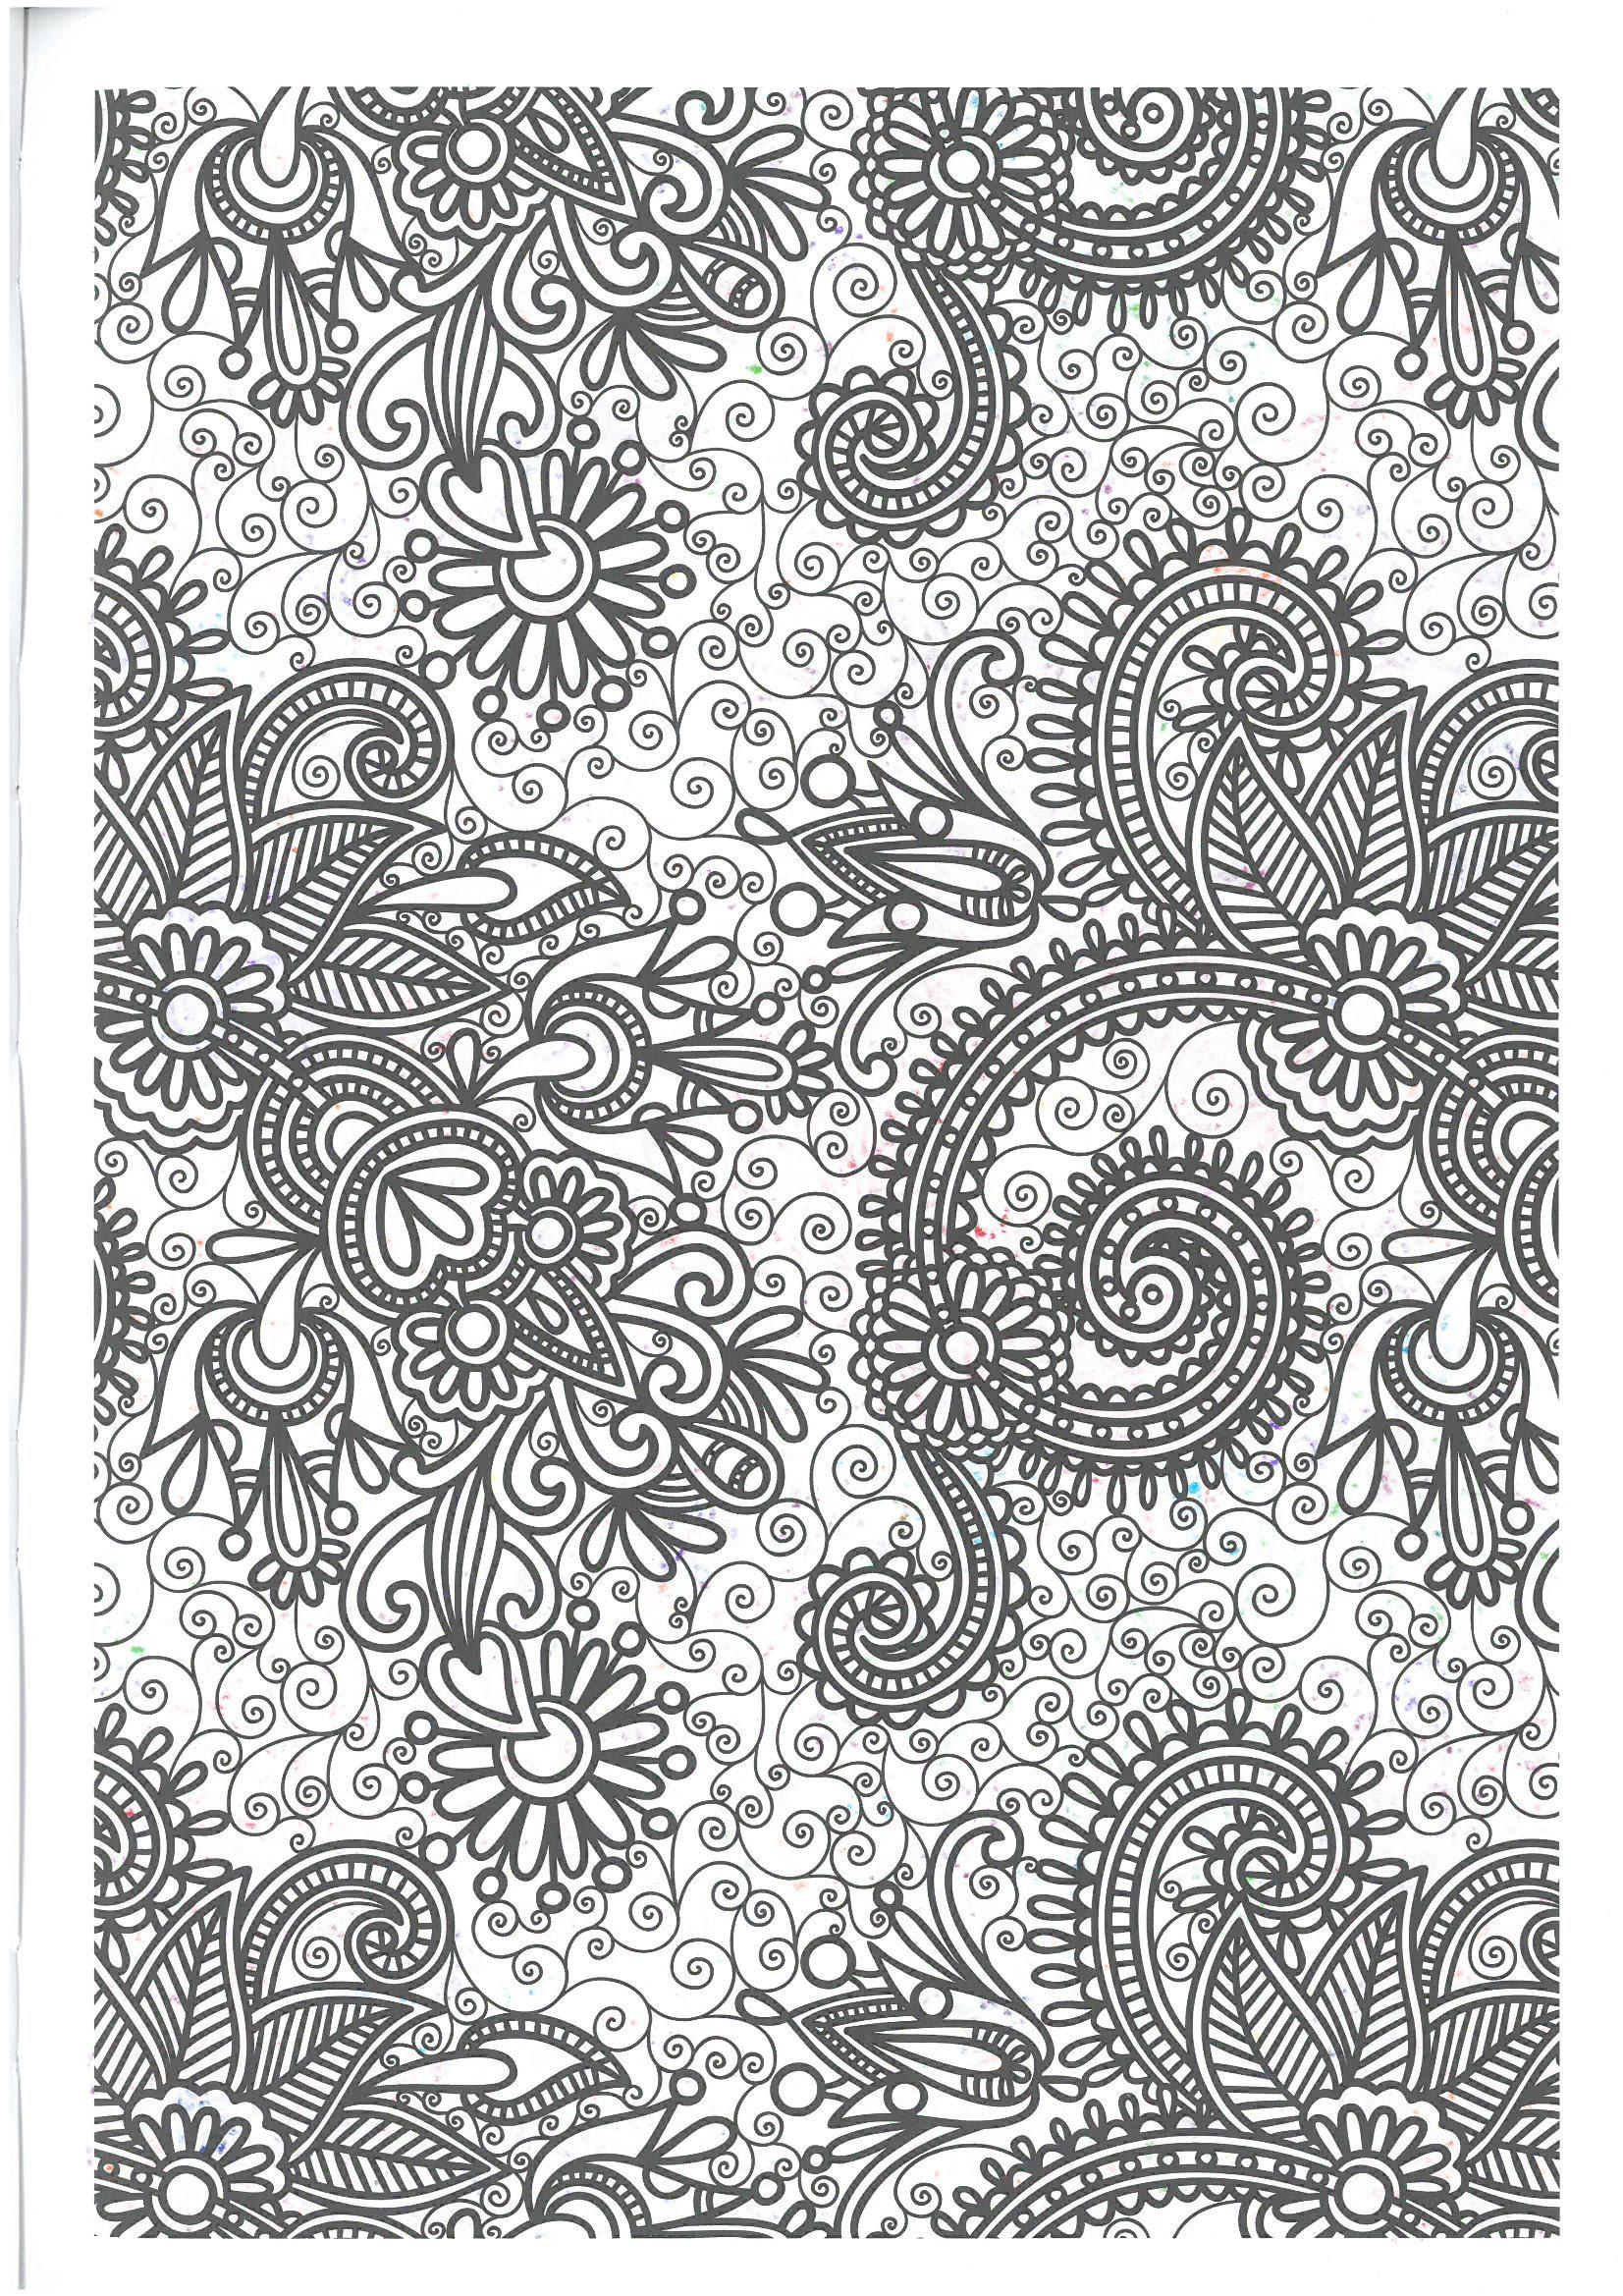 Coloring, Colorir, Desenho | Mandalas, Zengalas, Doodles para ...